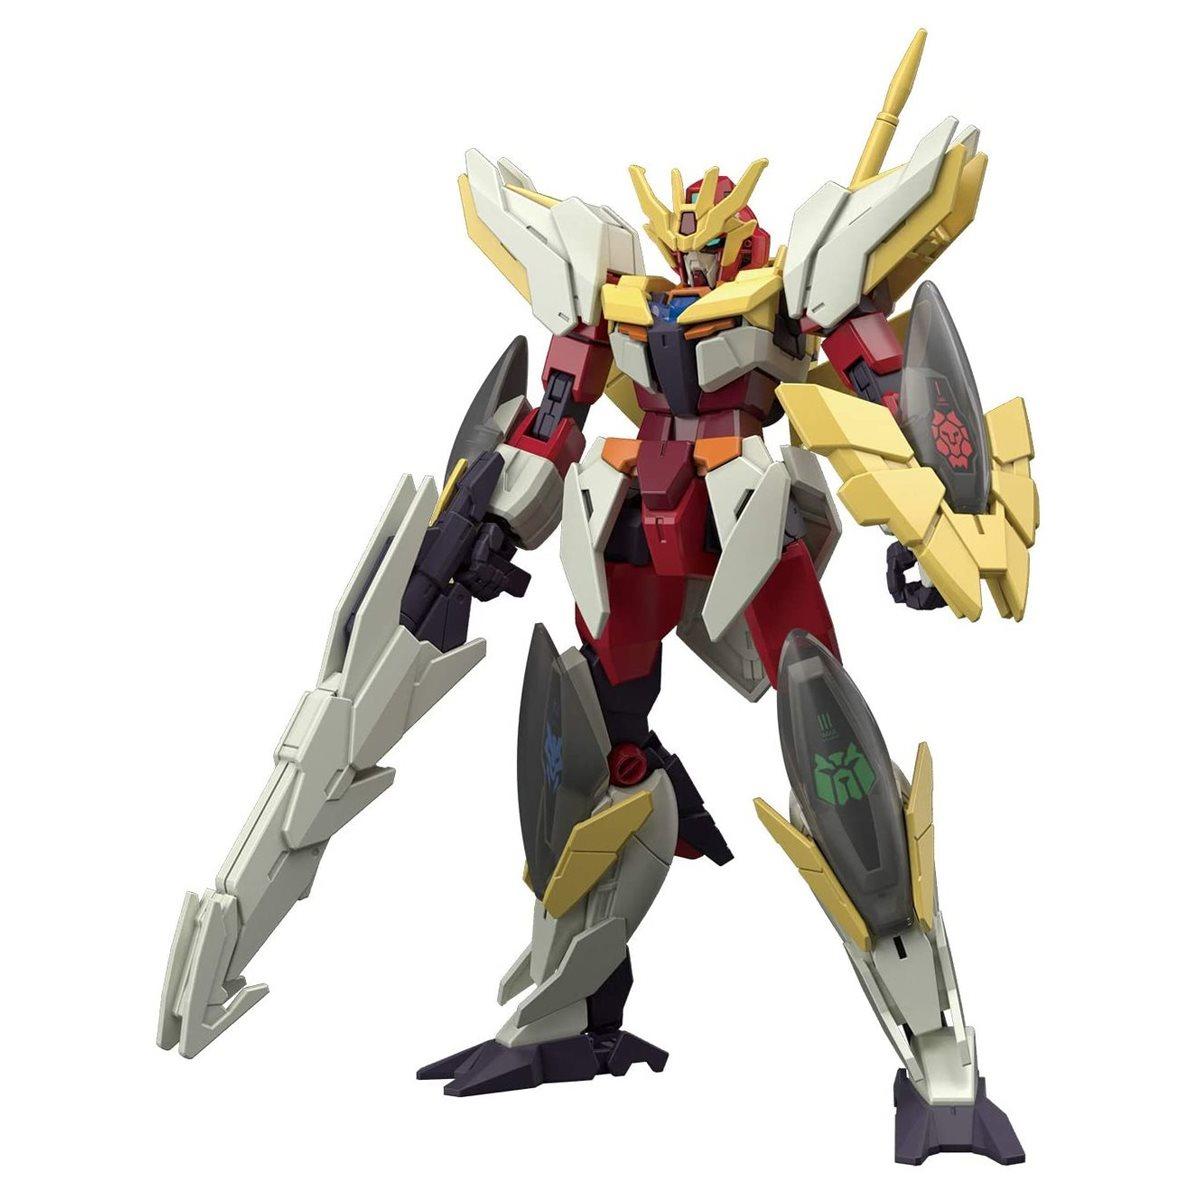 Gundam Anima[RIZE] Gundam Build Divers RERise #34 HGBD 1144 Scale Model Kit (Main)